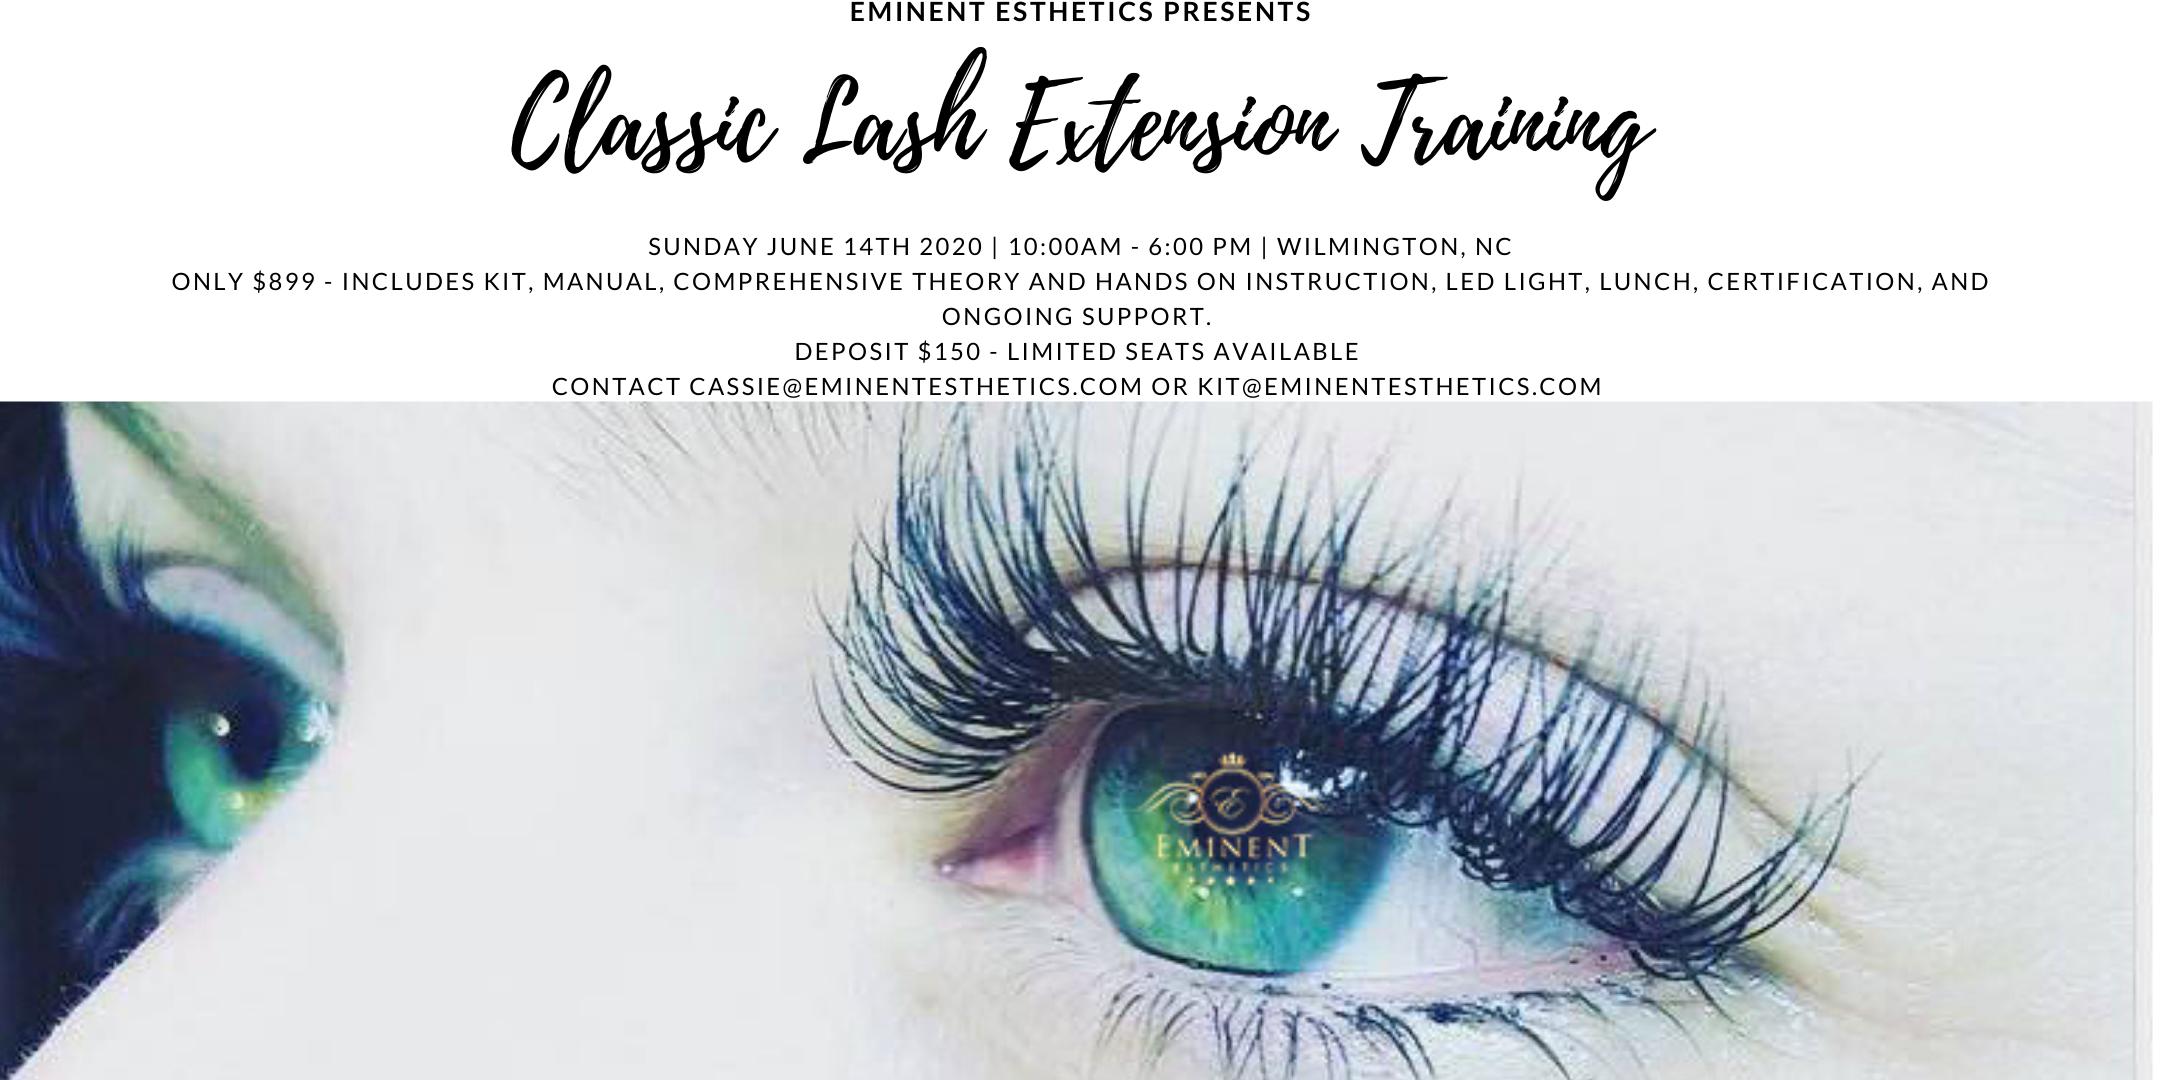 Classic Eyelash Extension Training And Certification 14 Jun 2020